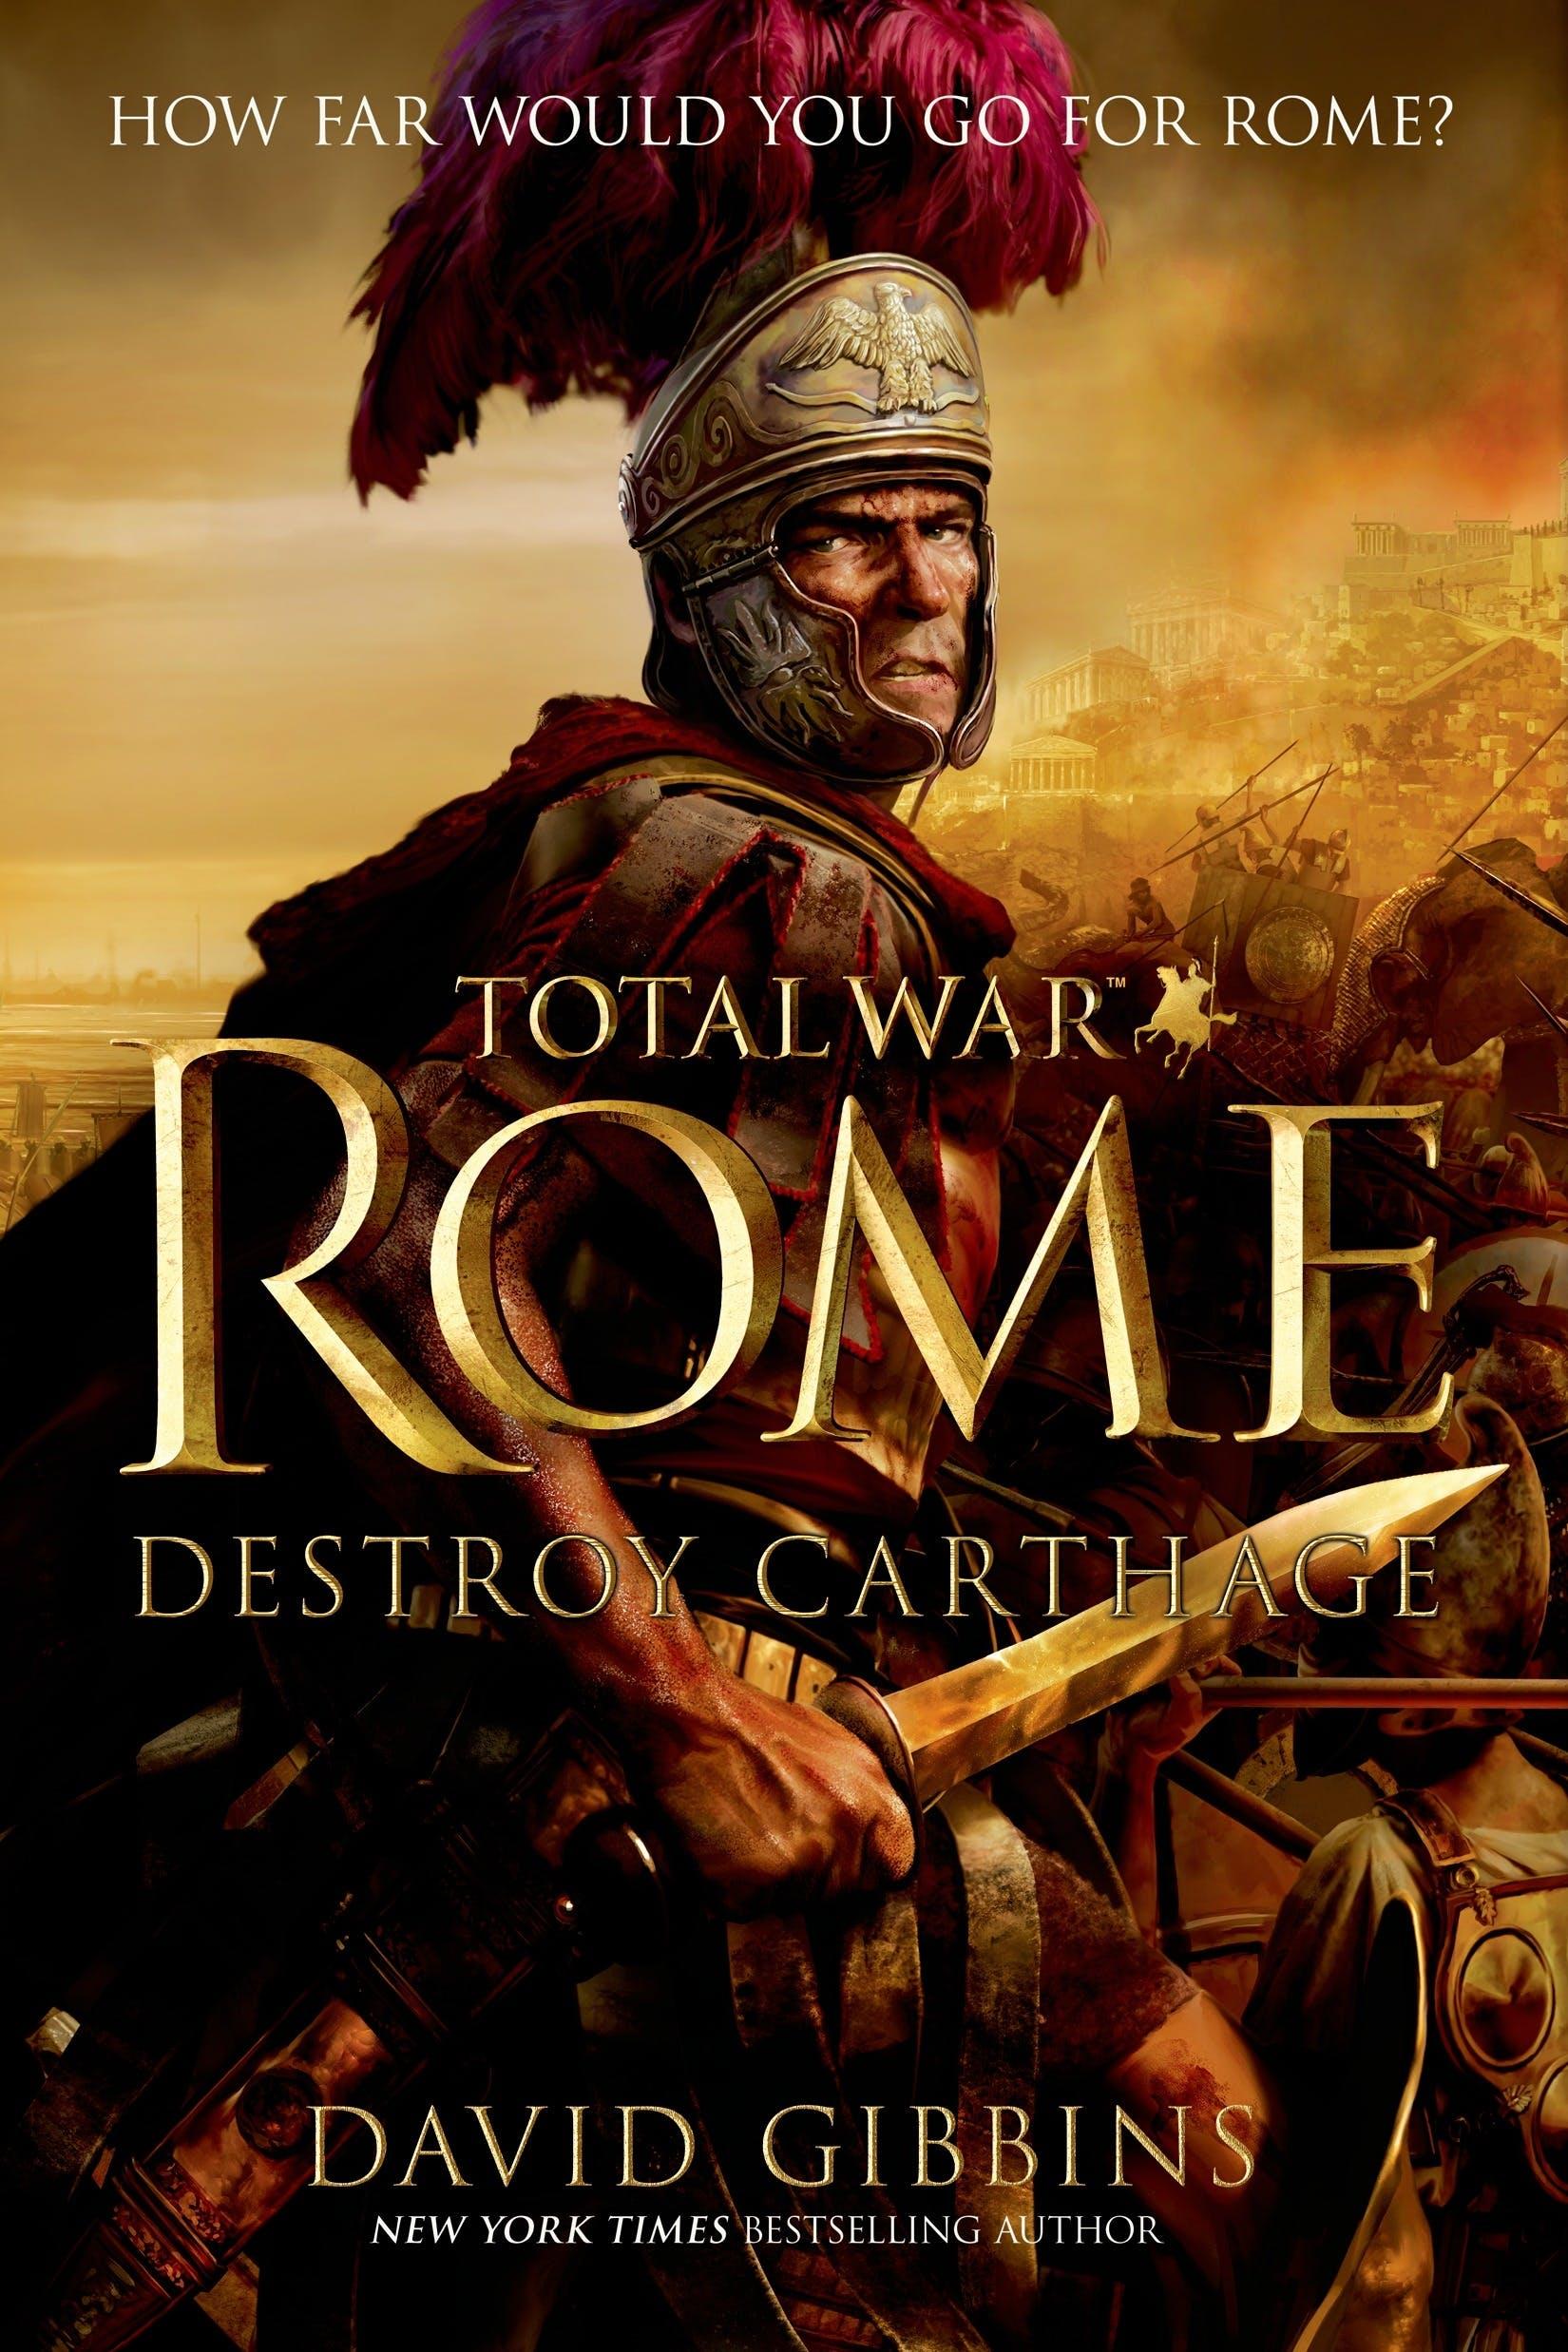 Image of Total War Rome: Destroy Carthage